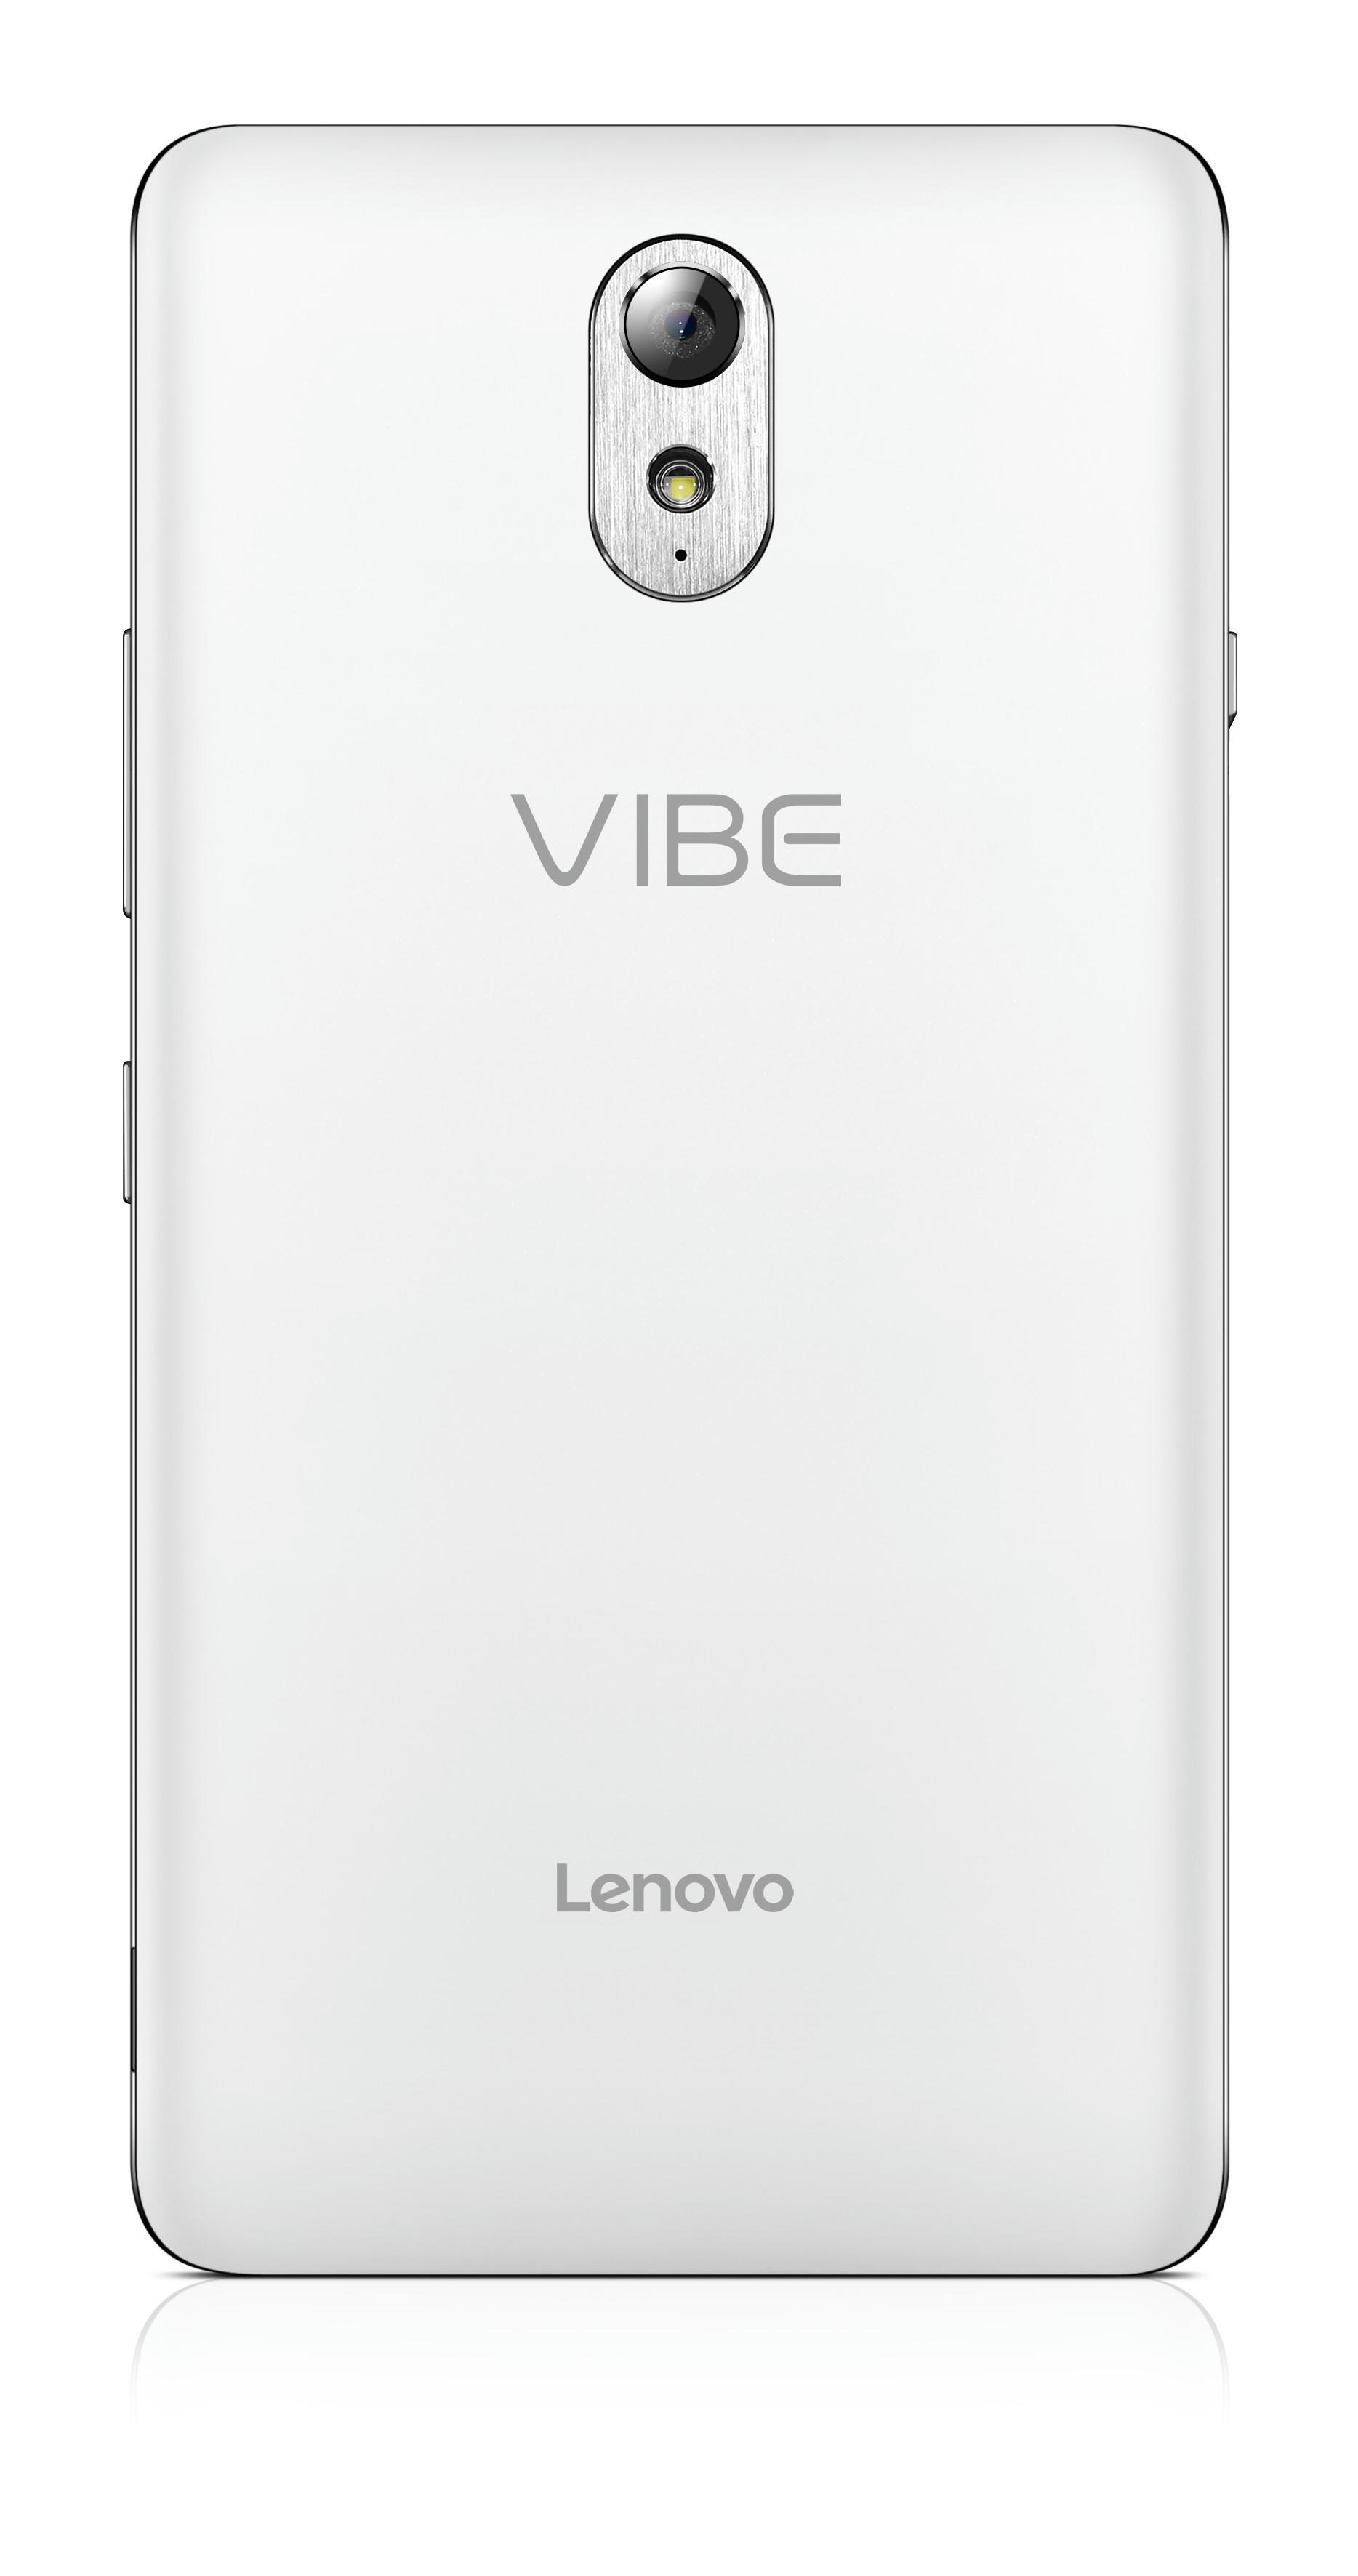 Lenovo Vibe P1M White Back